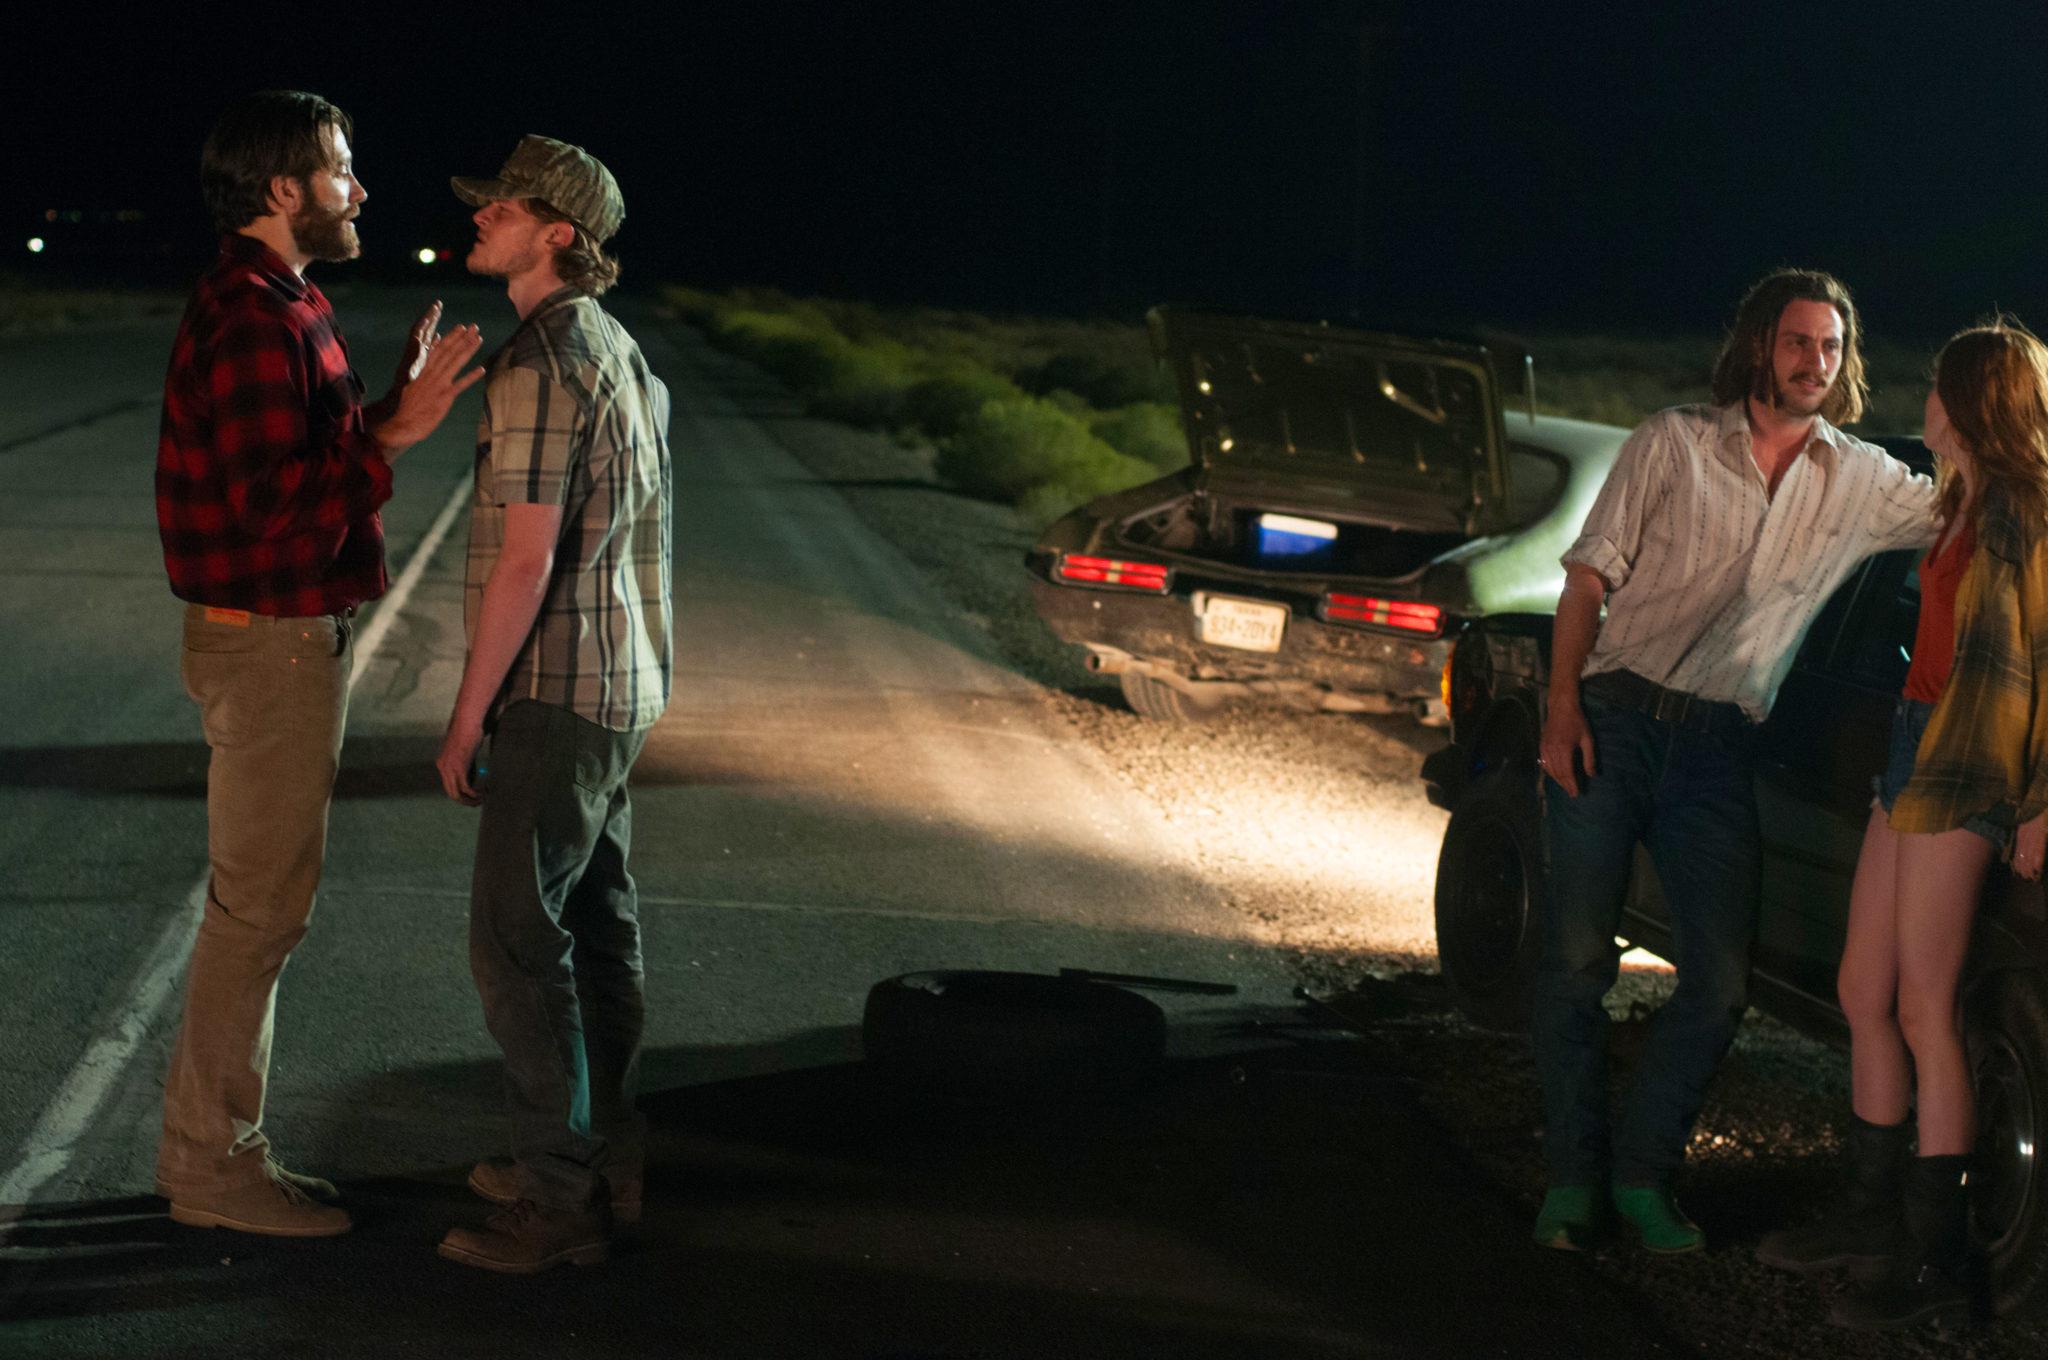 Tony Hastings (Jake Gyllenhaal) im Streit mit dem gewalttätigen Turk (Robert Aramayo) während Ray (Aaron Taylor-Johnson) sich an Tonys Tochter India (Ellie Bamber) heranmacht (Foto: Merrick Morton/Focus Features/Universal Pictures)